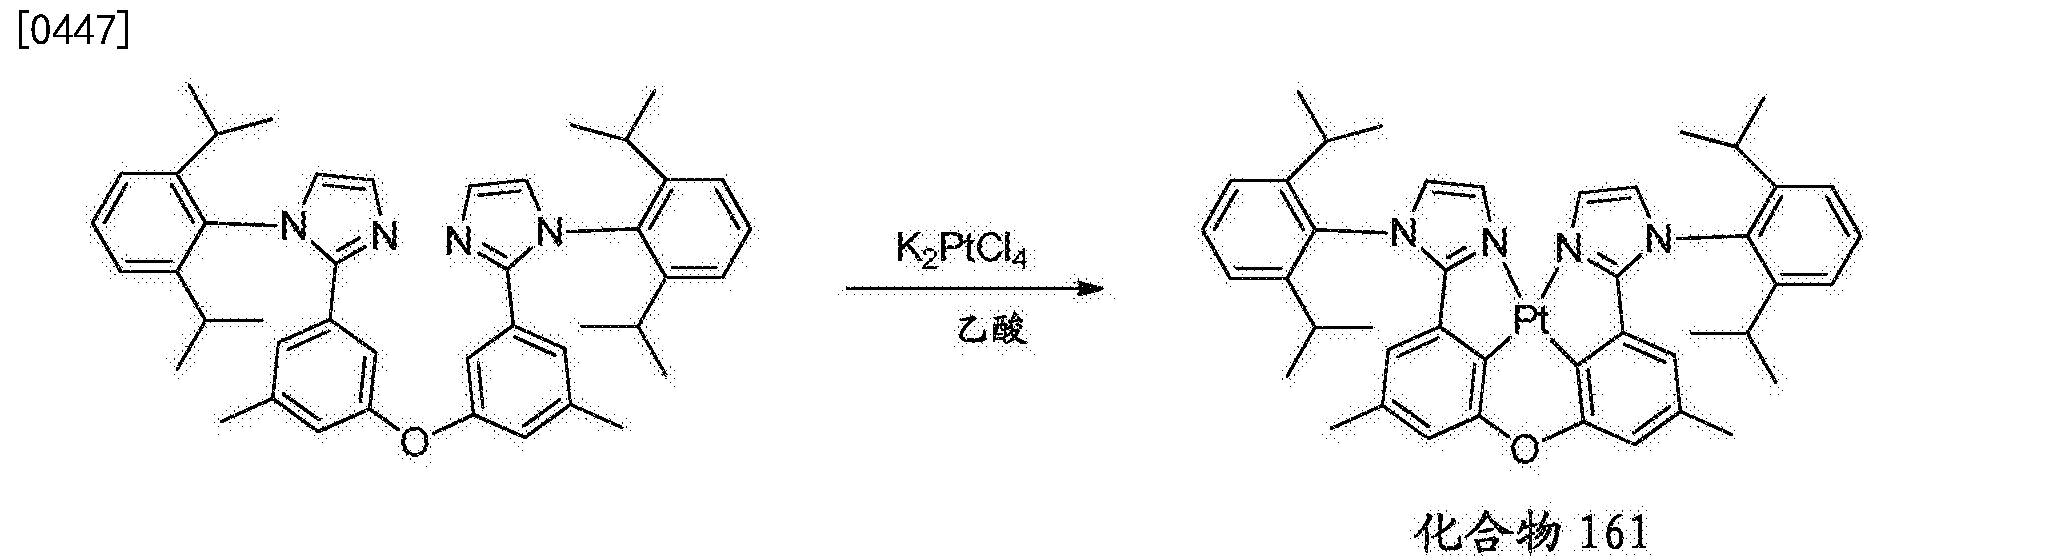 Figure CN106749425AD01432